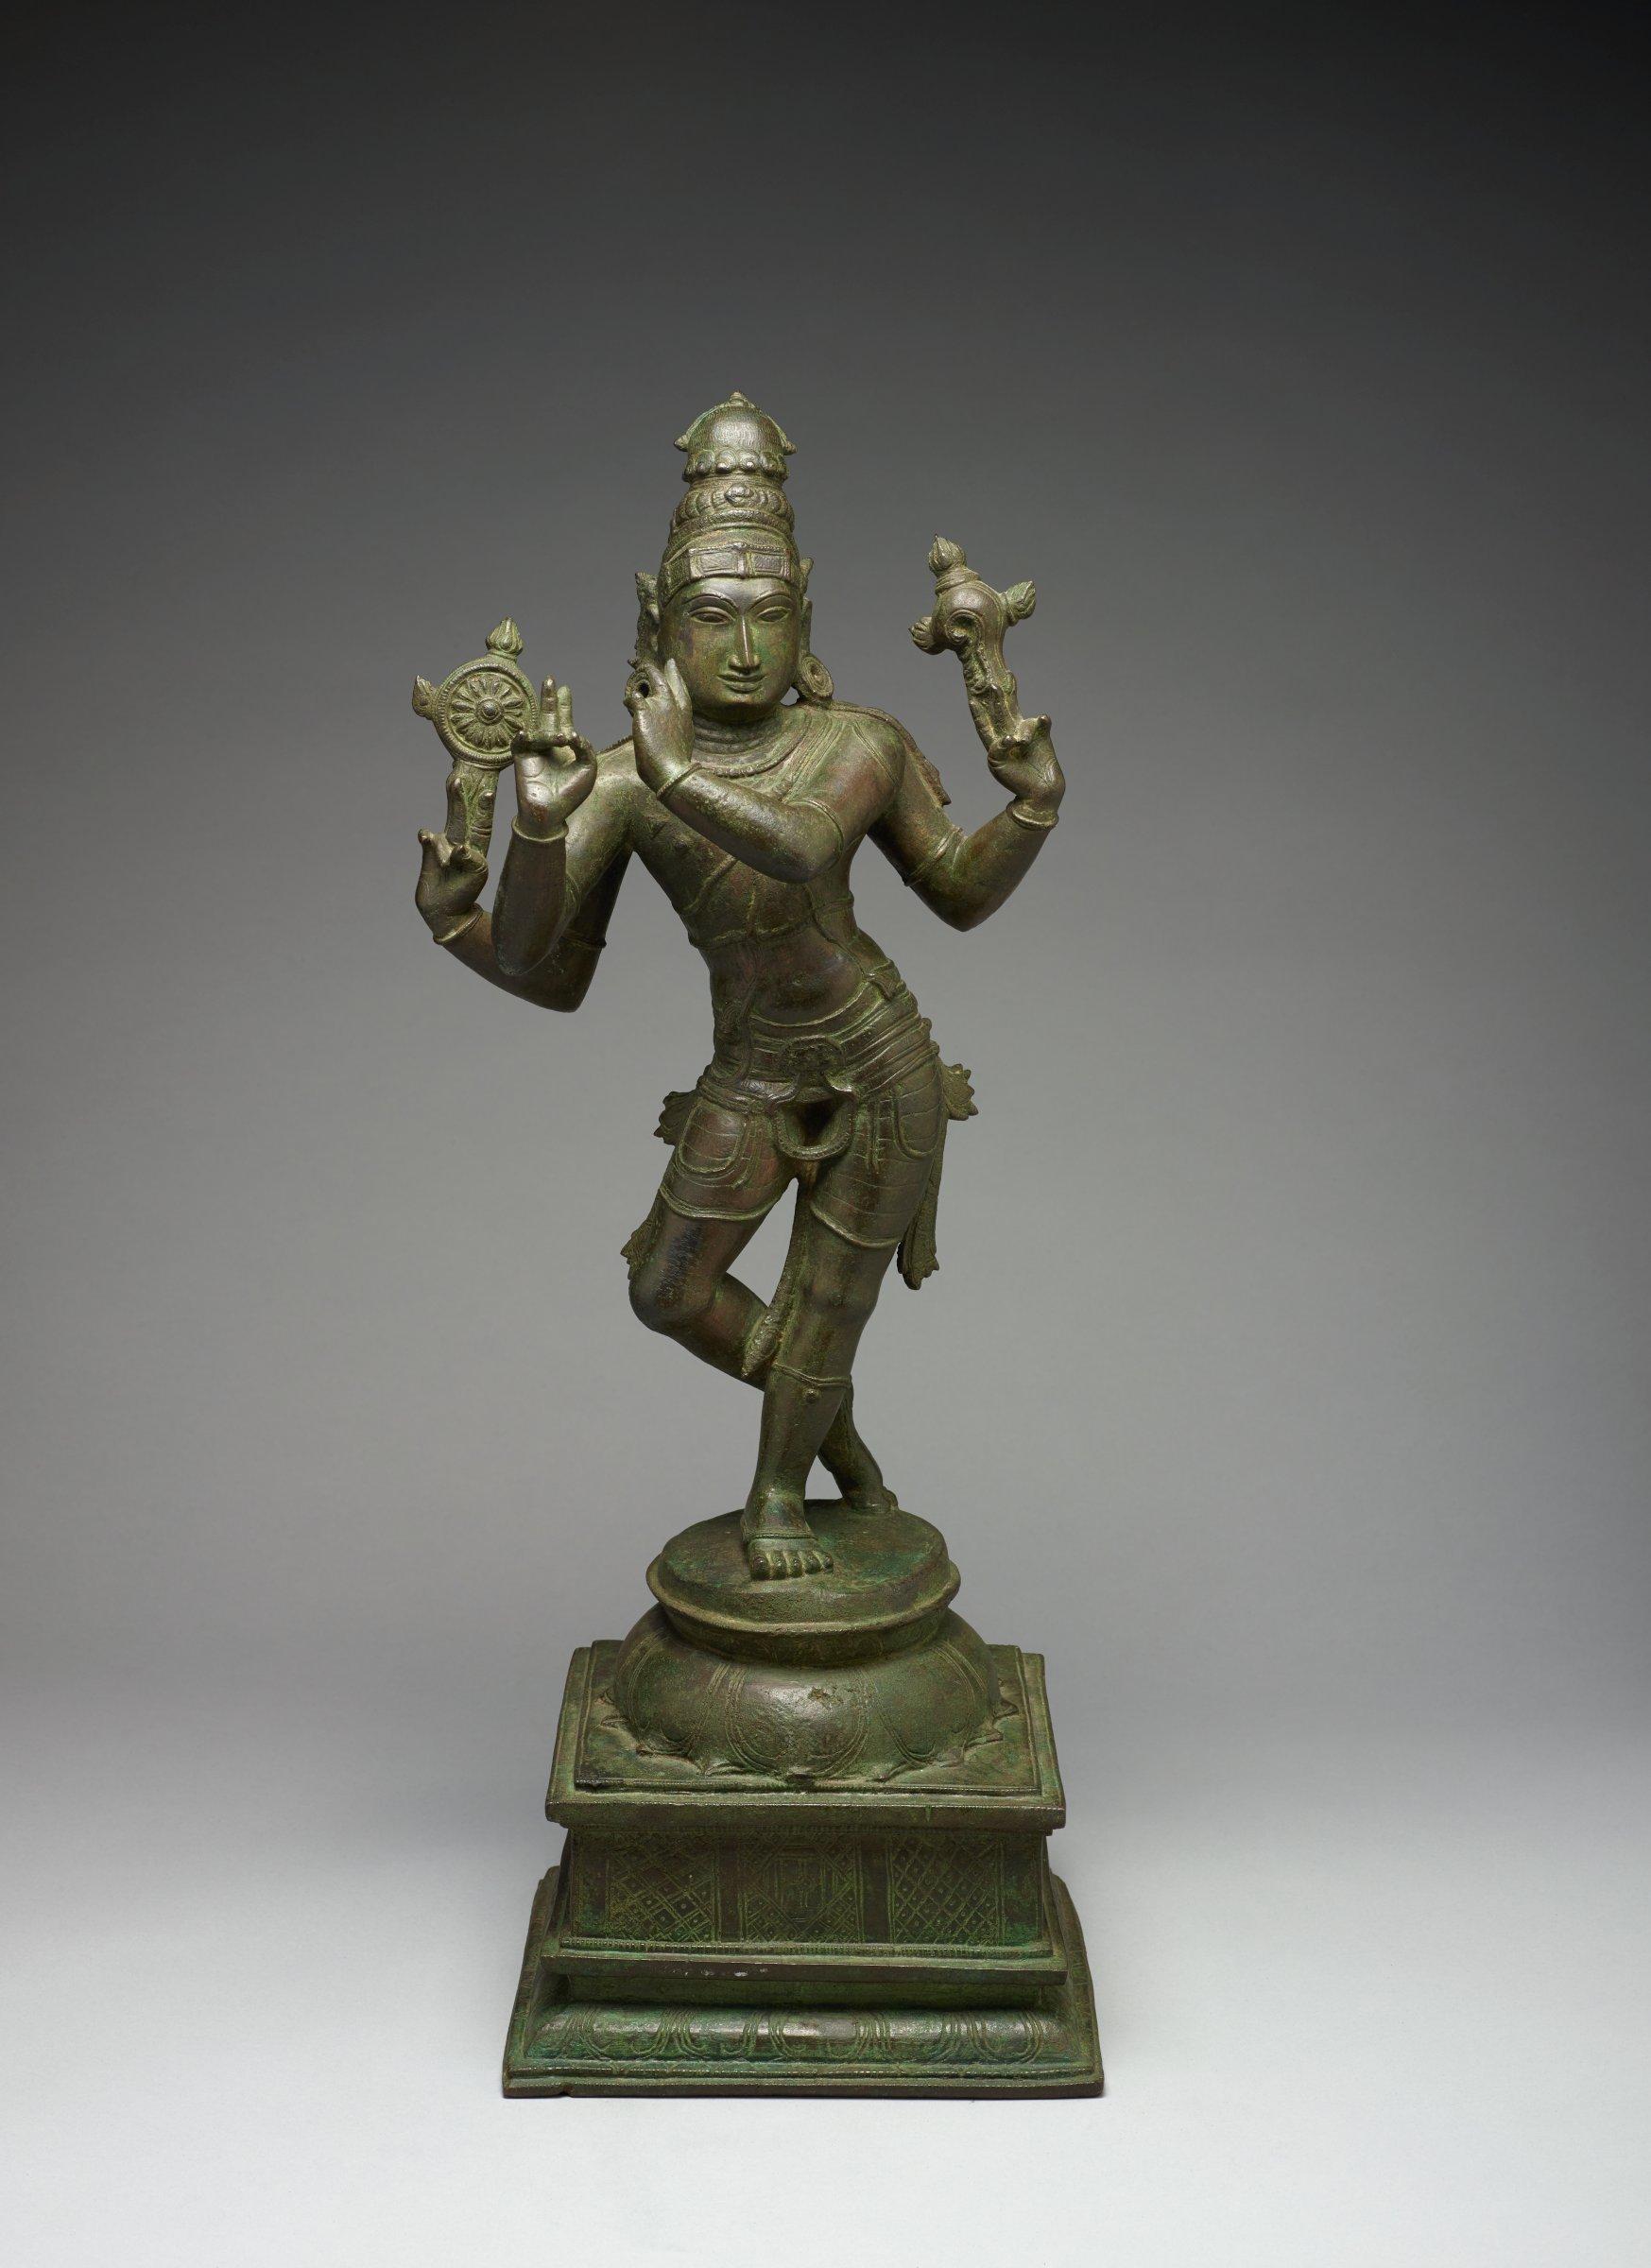 Hindu God Vishnu as Venugopala (Flute-Player), India, bronze